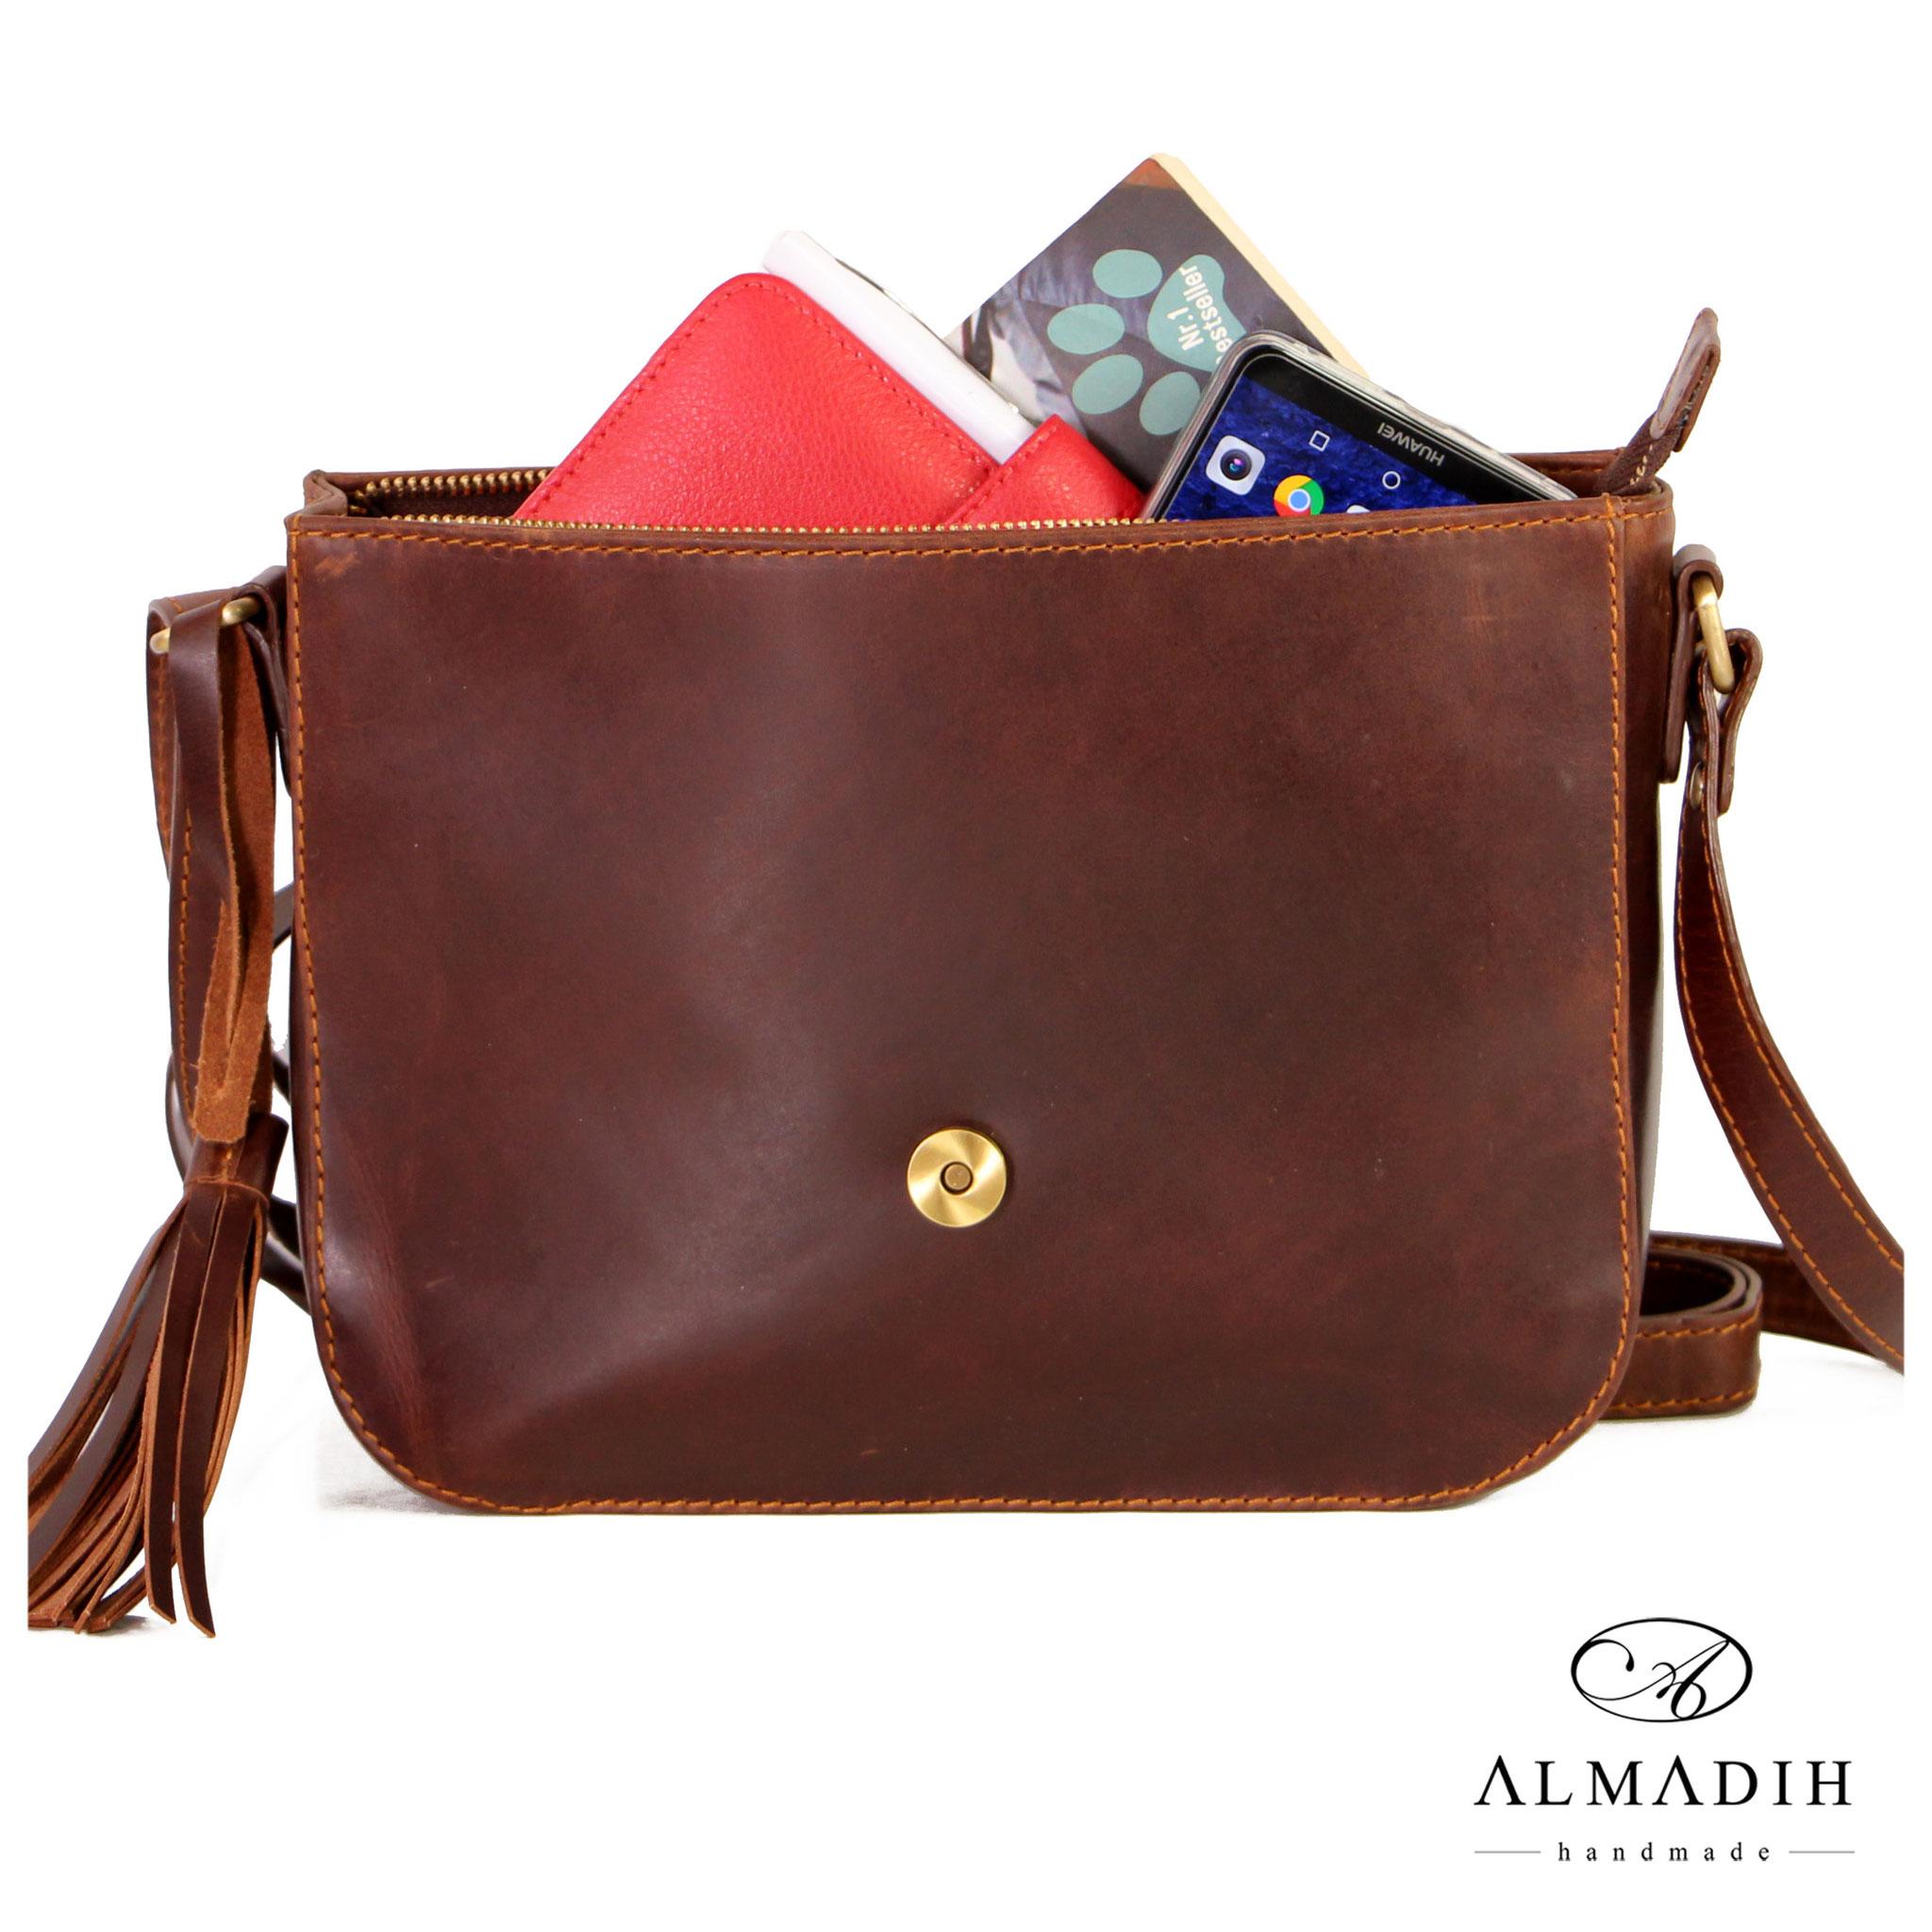 2100e389a787c ALMADIH-Damentasche-M36-ELsa - minadesign Mina Design Ledertaschen  Ledermappe Büroaccessoires Lederkissen Aktentaschen